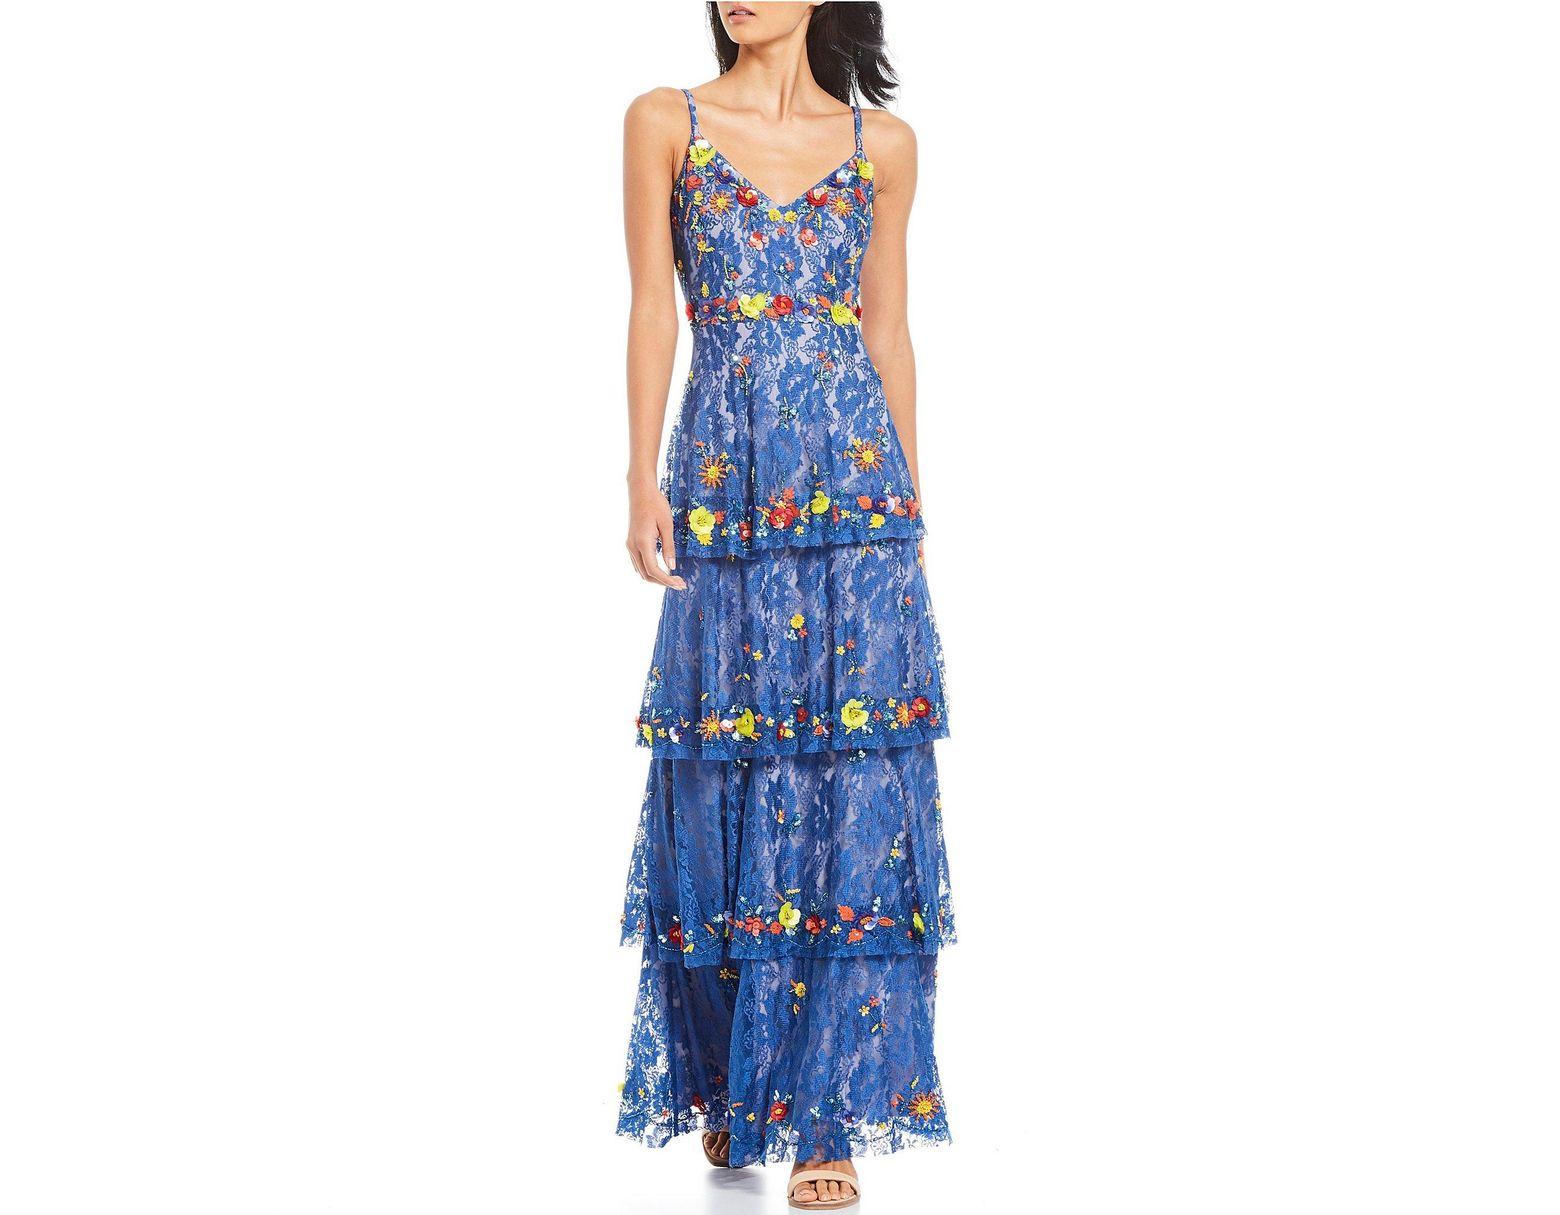 dcd256cc73aa6 Women's Blue Dani Floral Beaded Sequin Detail Ruffle Tiered Lace Maxi Dress